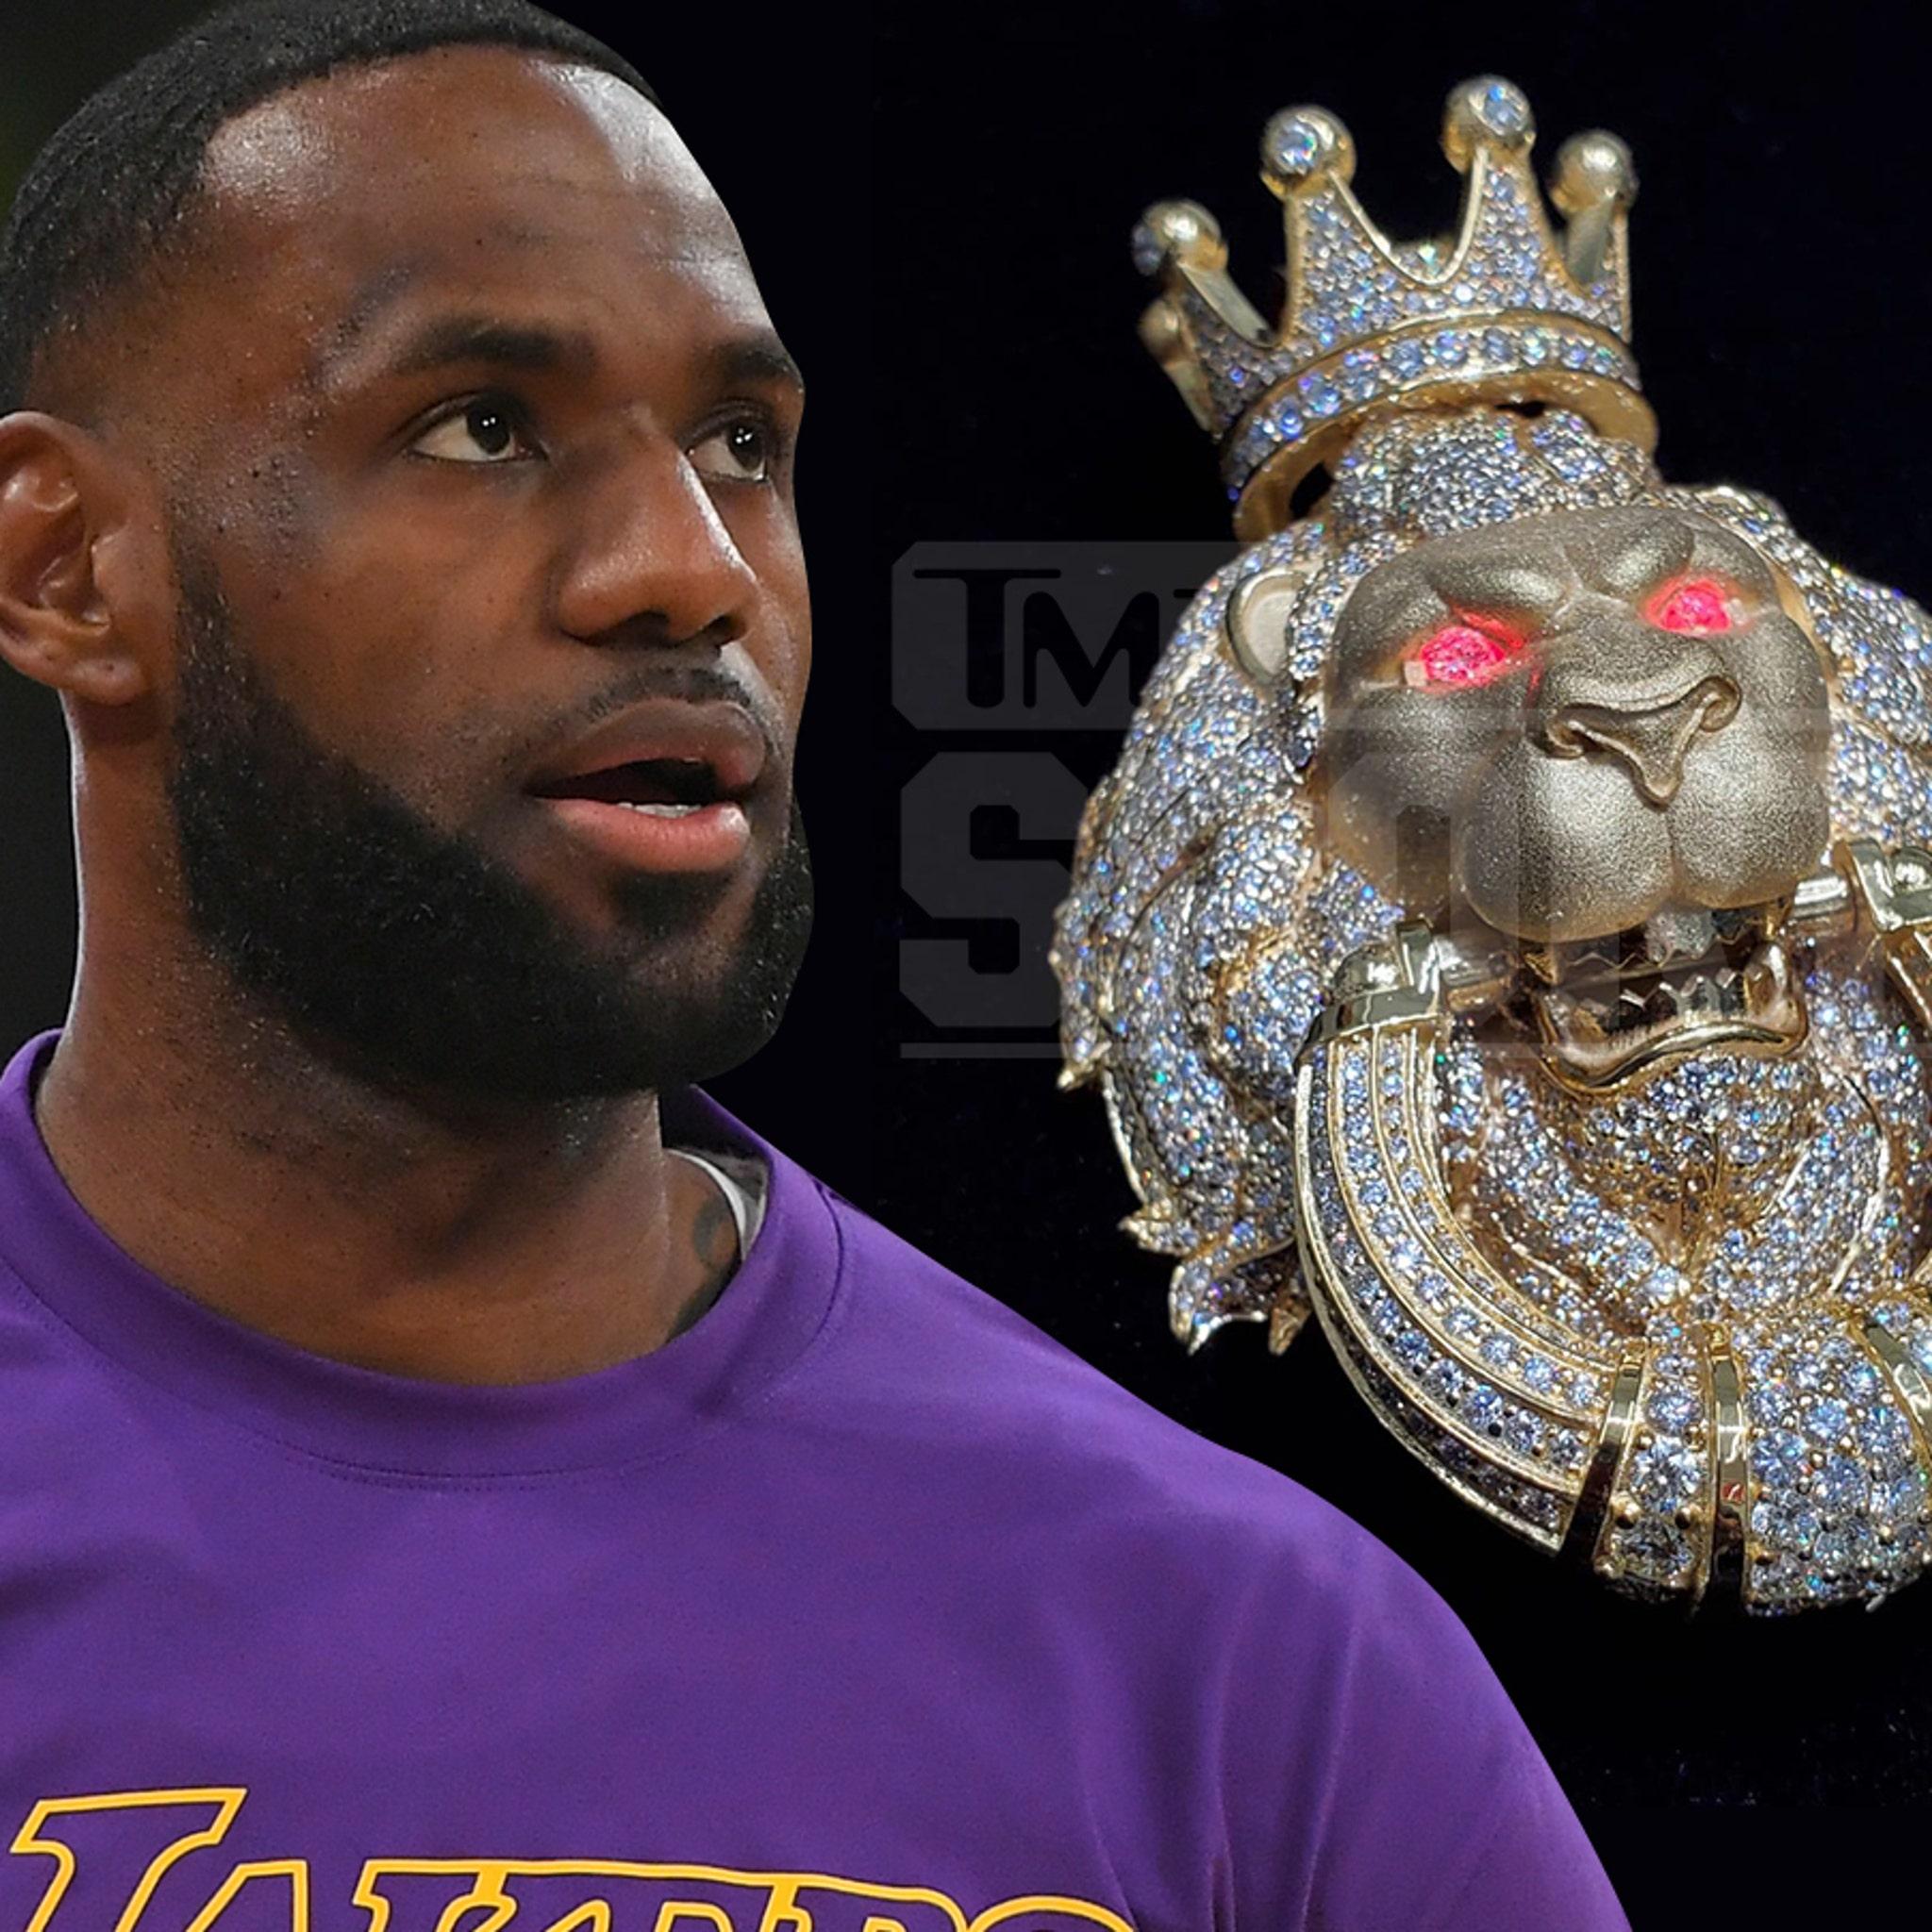 LeBron James Cops Incredible Light-Up Lion Gatekeeper Pendant